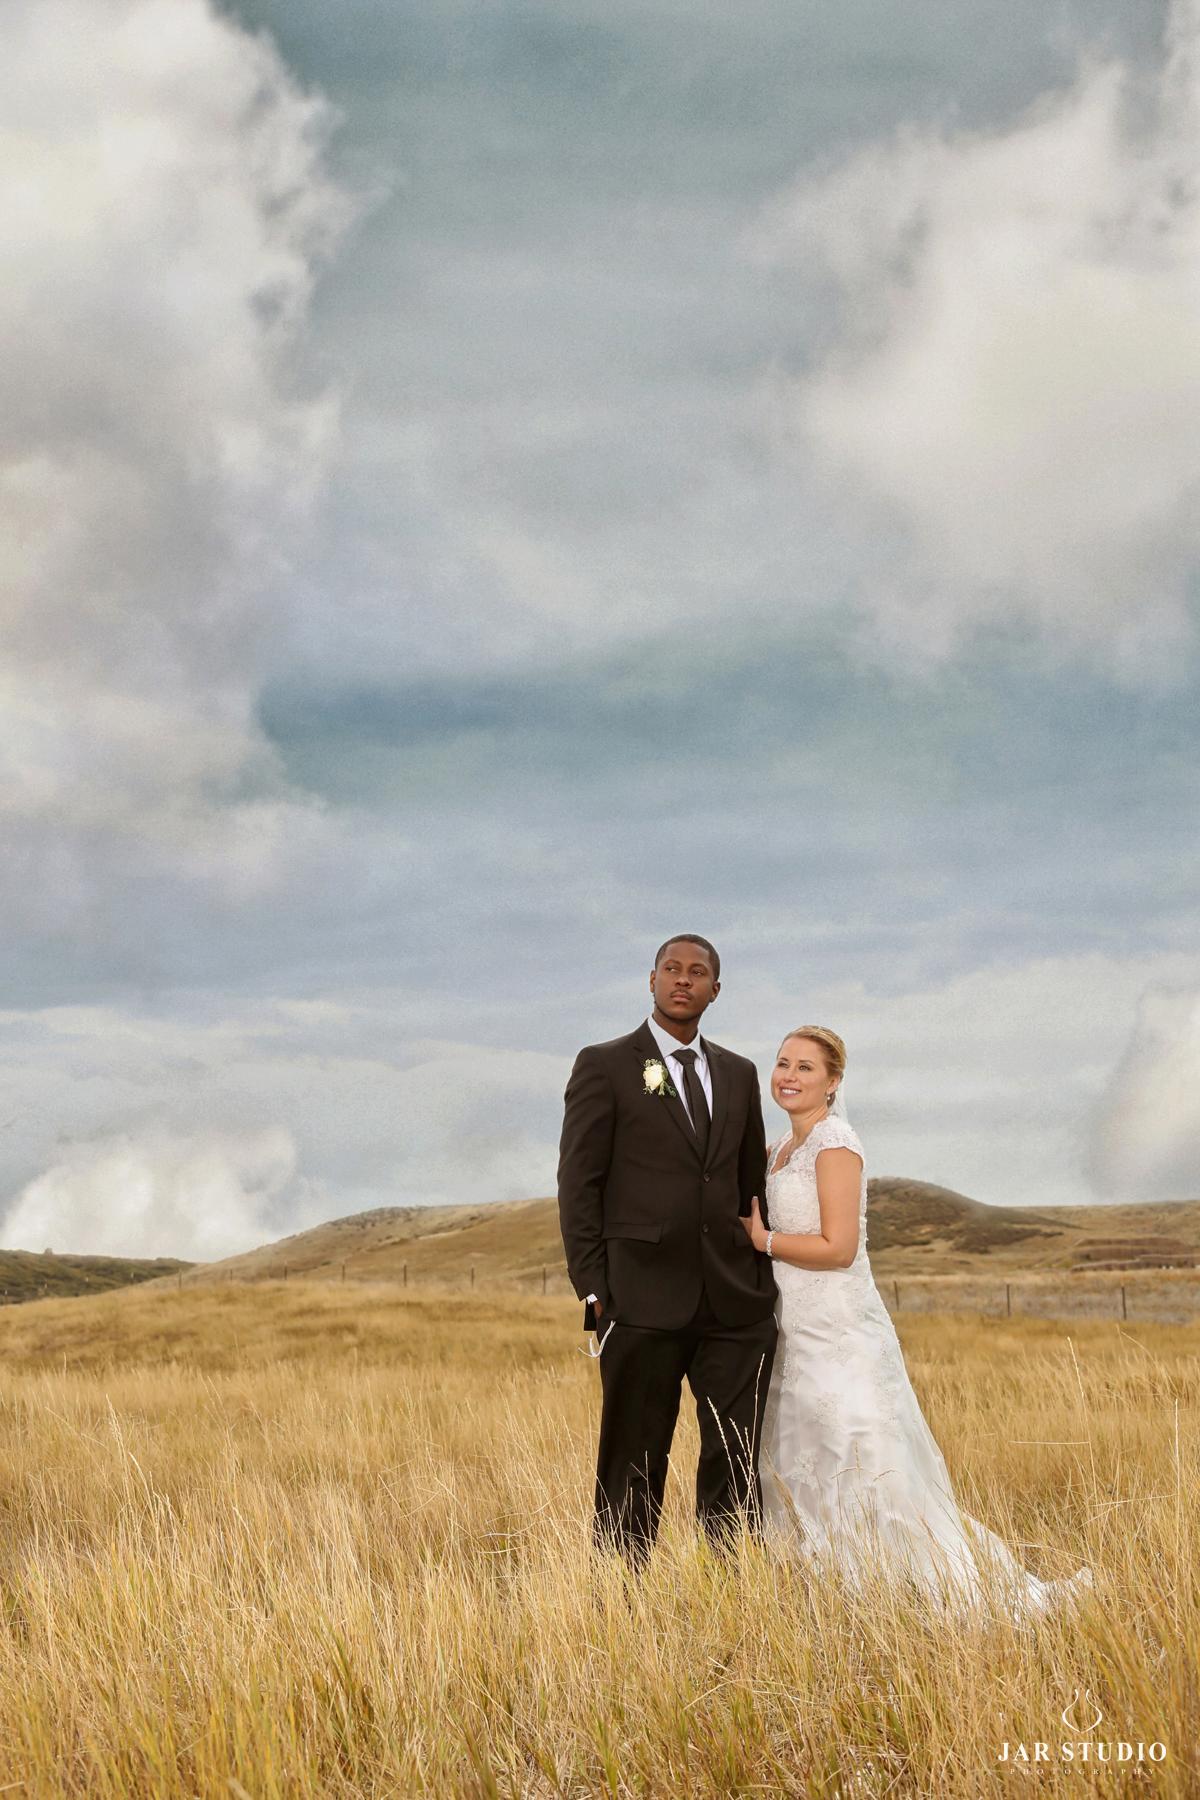 21-unique-wedding-portrait-jarstudio.jpg